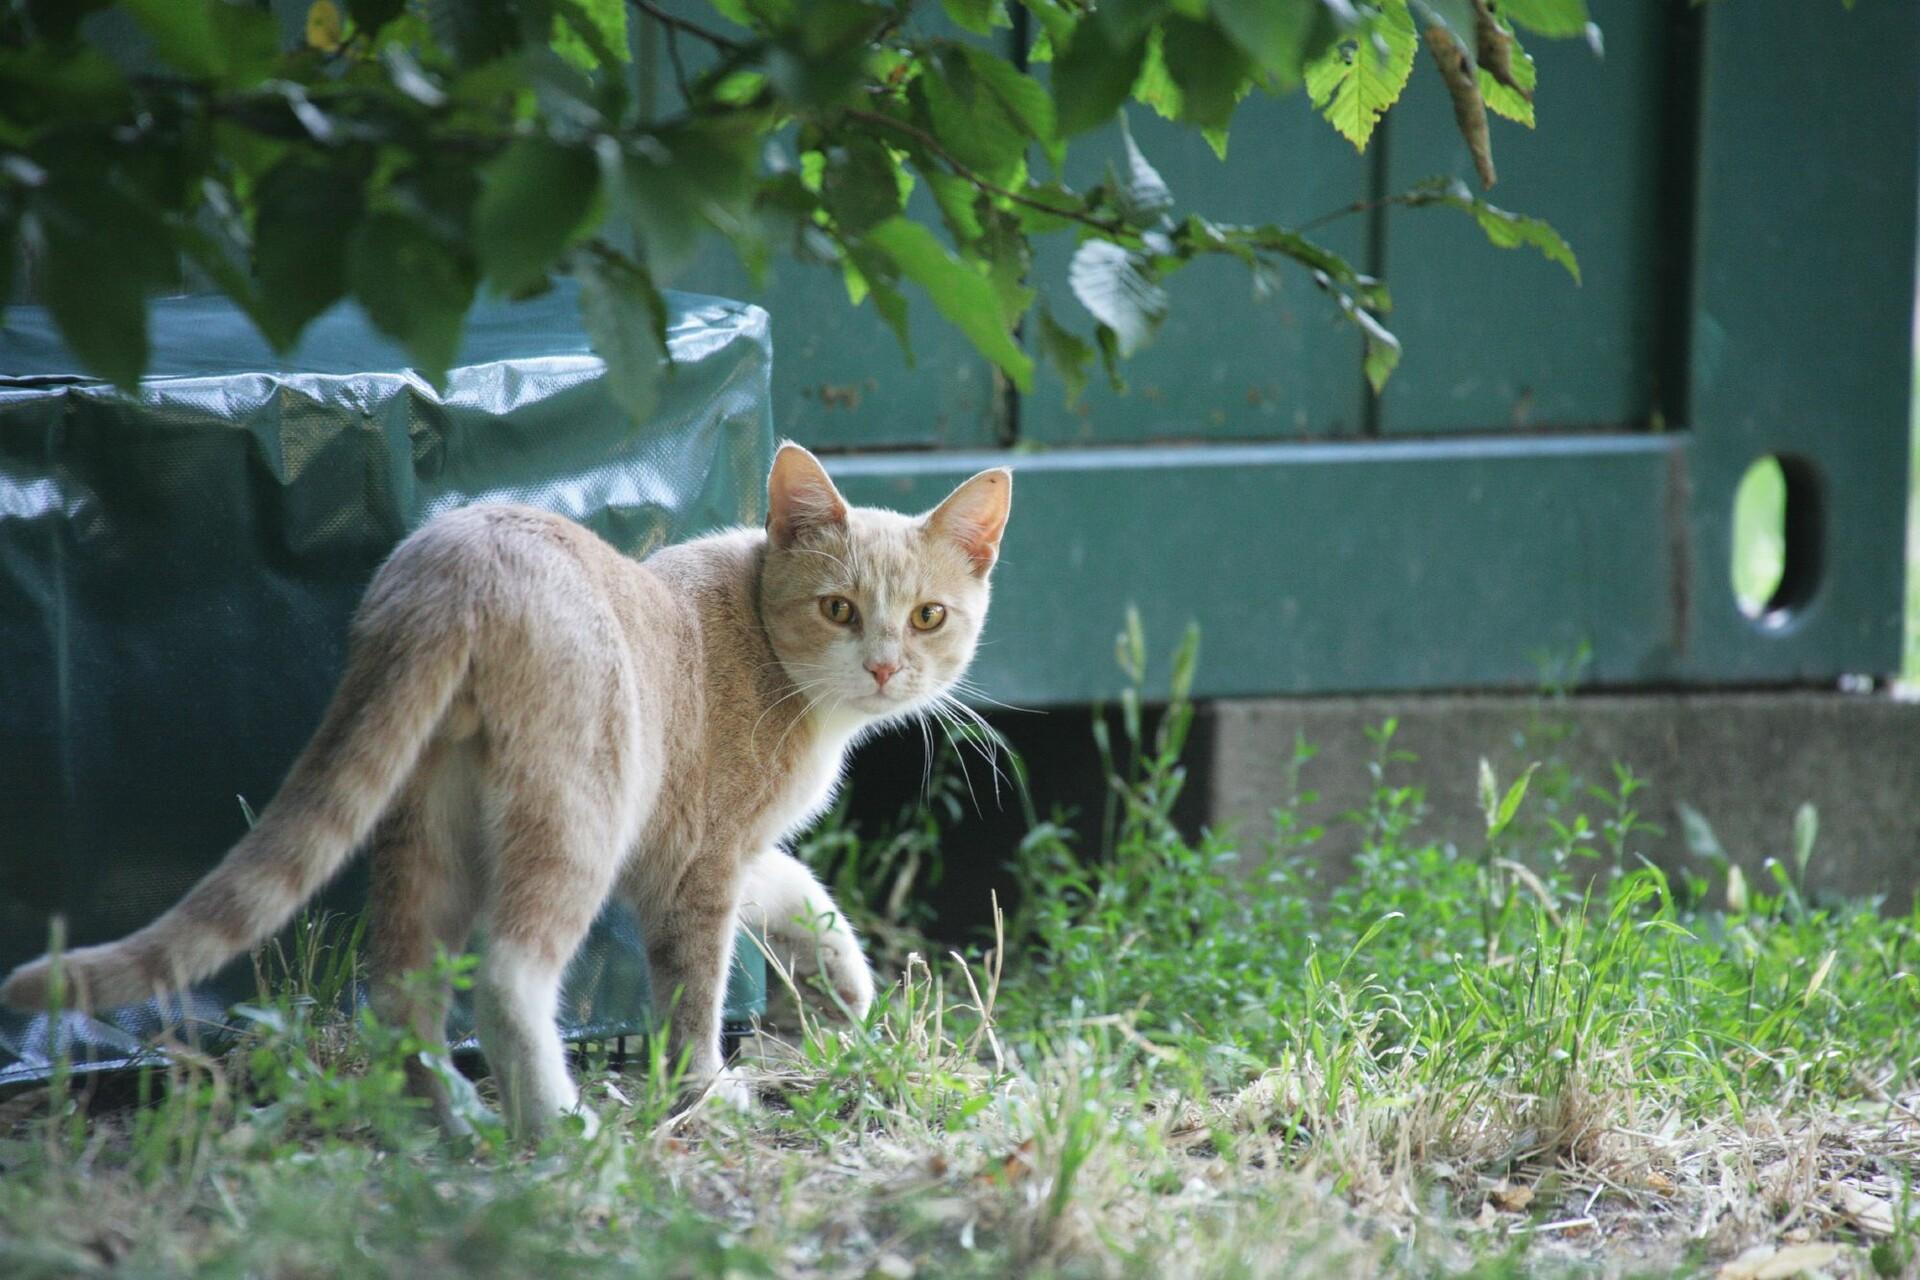 Stray animal care